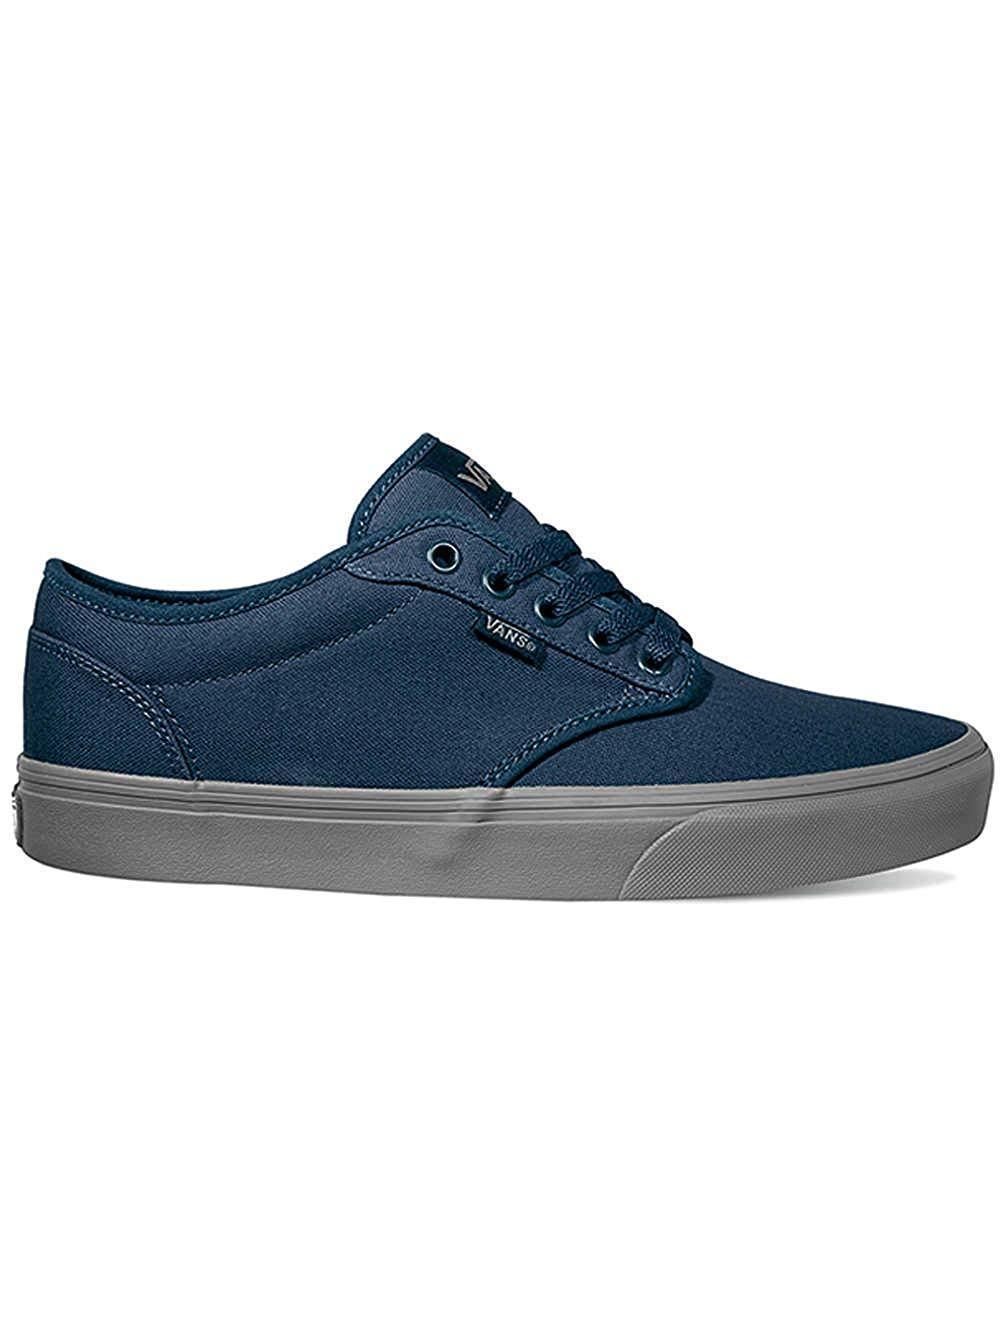 Vans Atwood (Check Liner) Dress Blue Mens Skate Shoes 6.5 WOMENS 8 BLUES NEW NIB